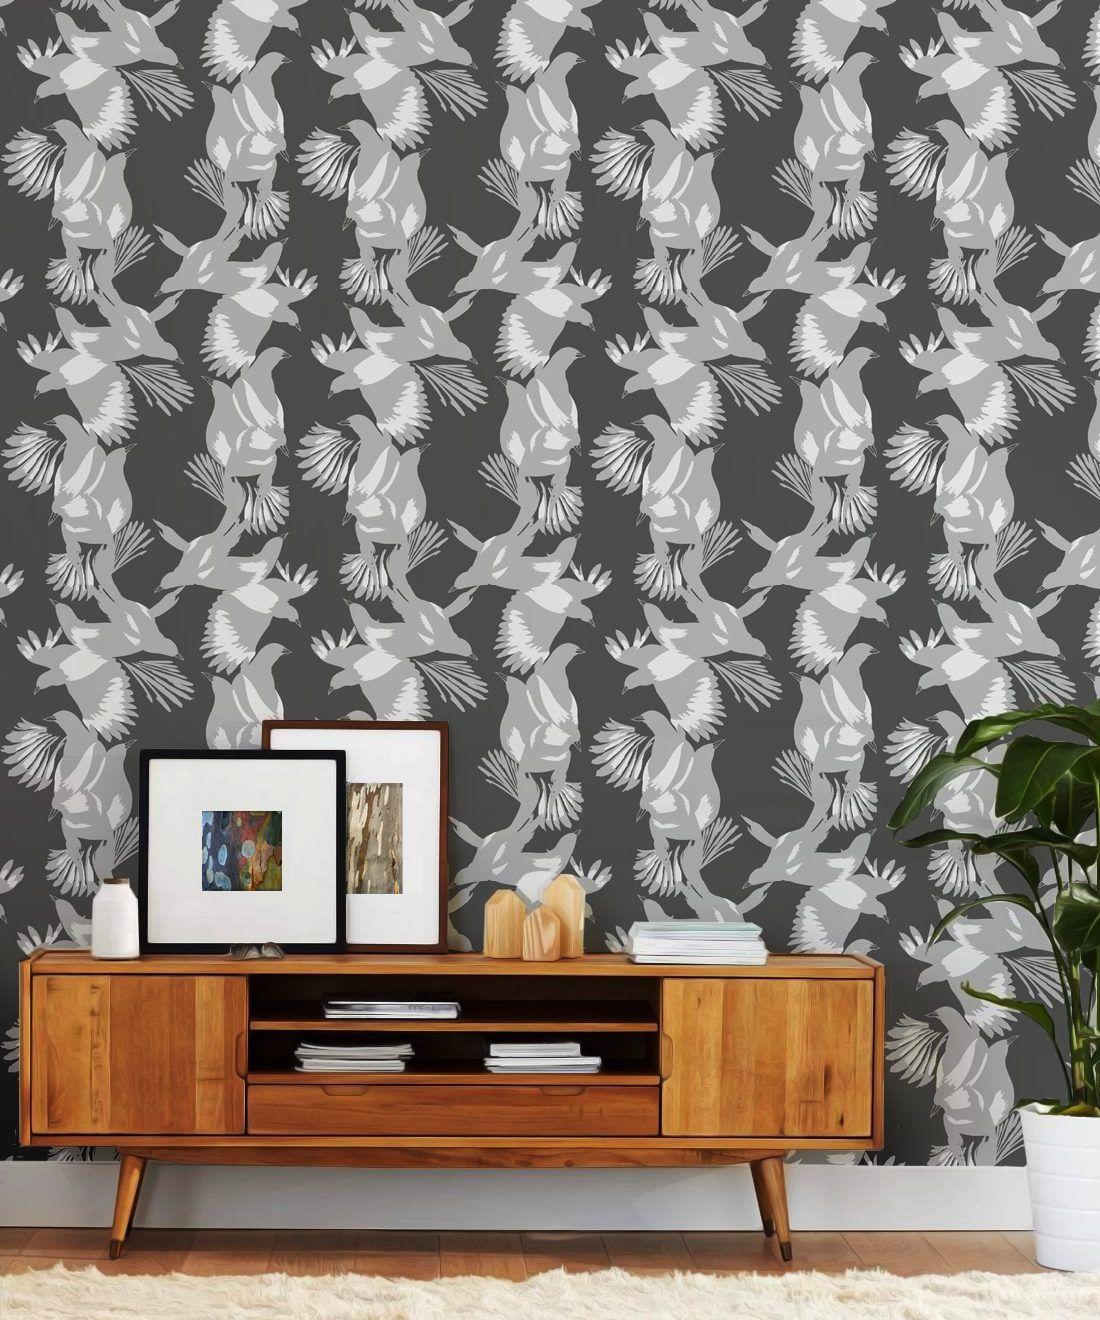 Magpie Wallpaper • Milton & King USA • Slate Charcoal Black Wallpaper Insitu